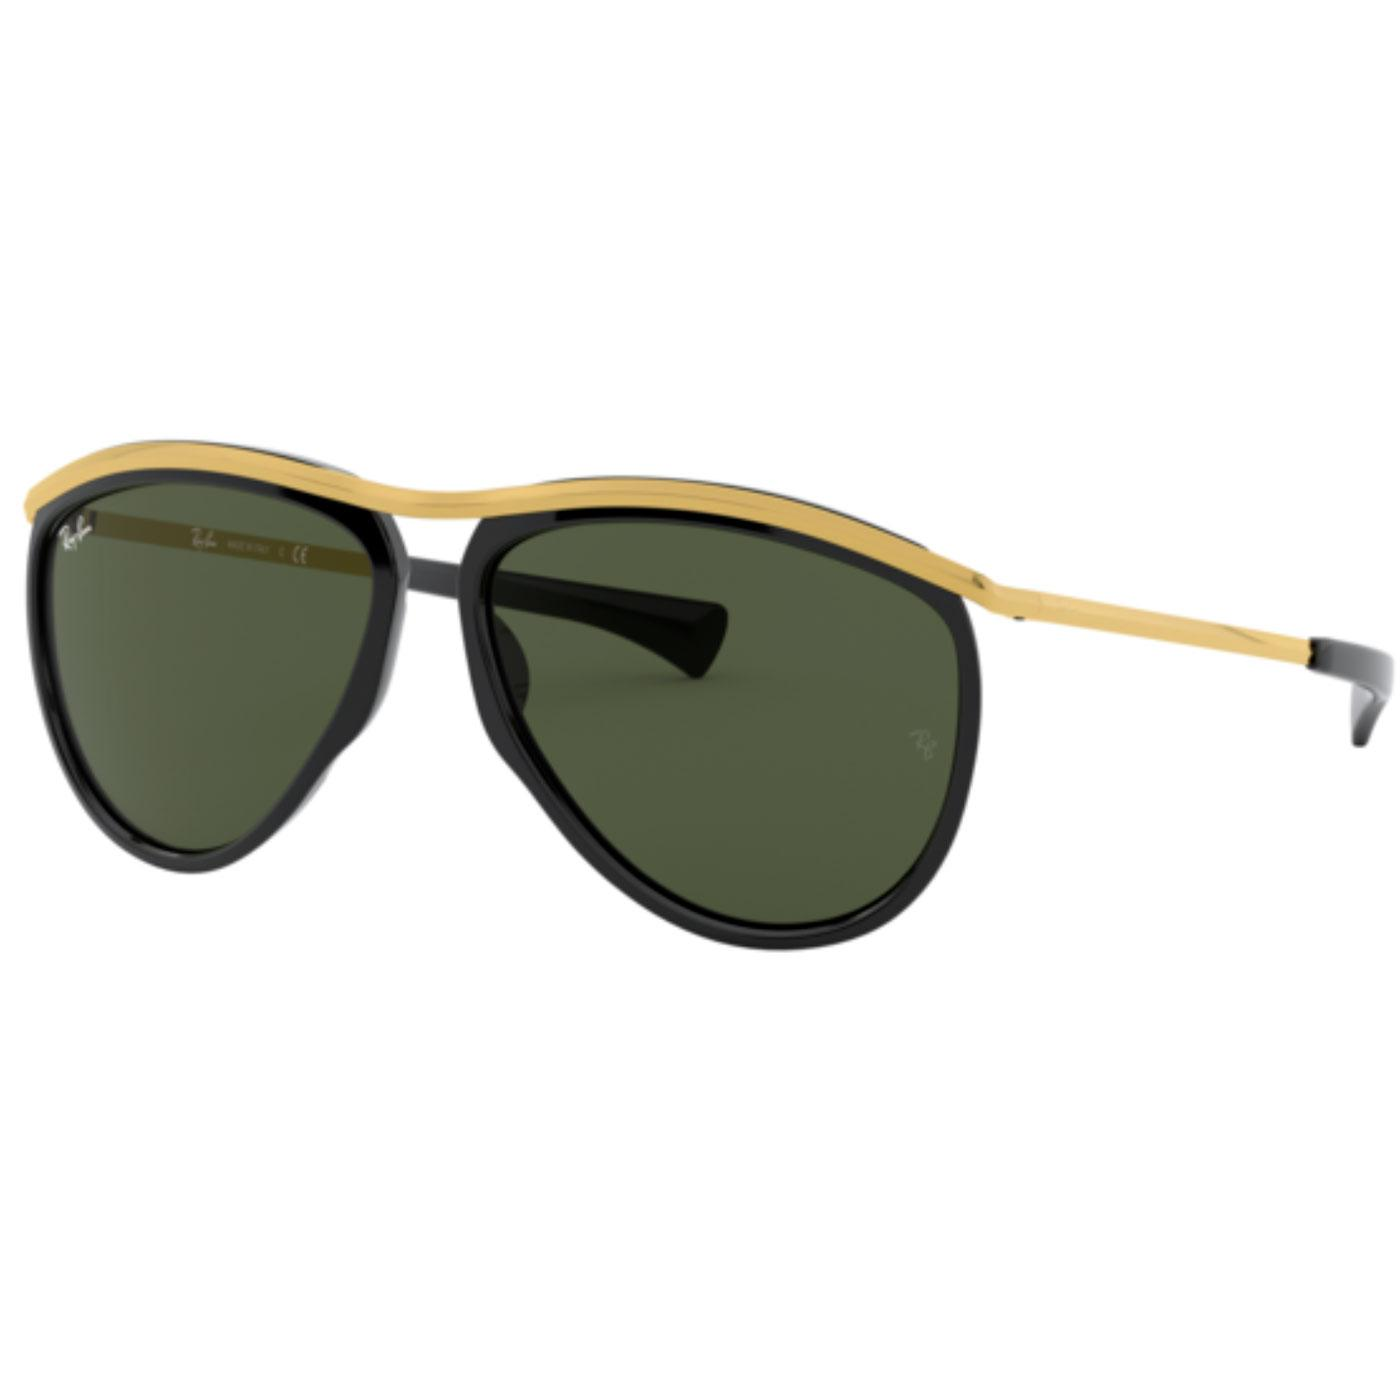 Olympian Aviator RAY-BAN Sunglasses (Black/Gold)